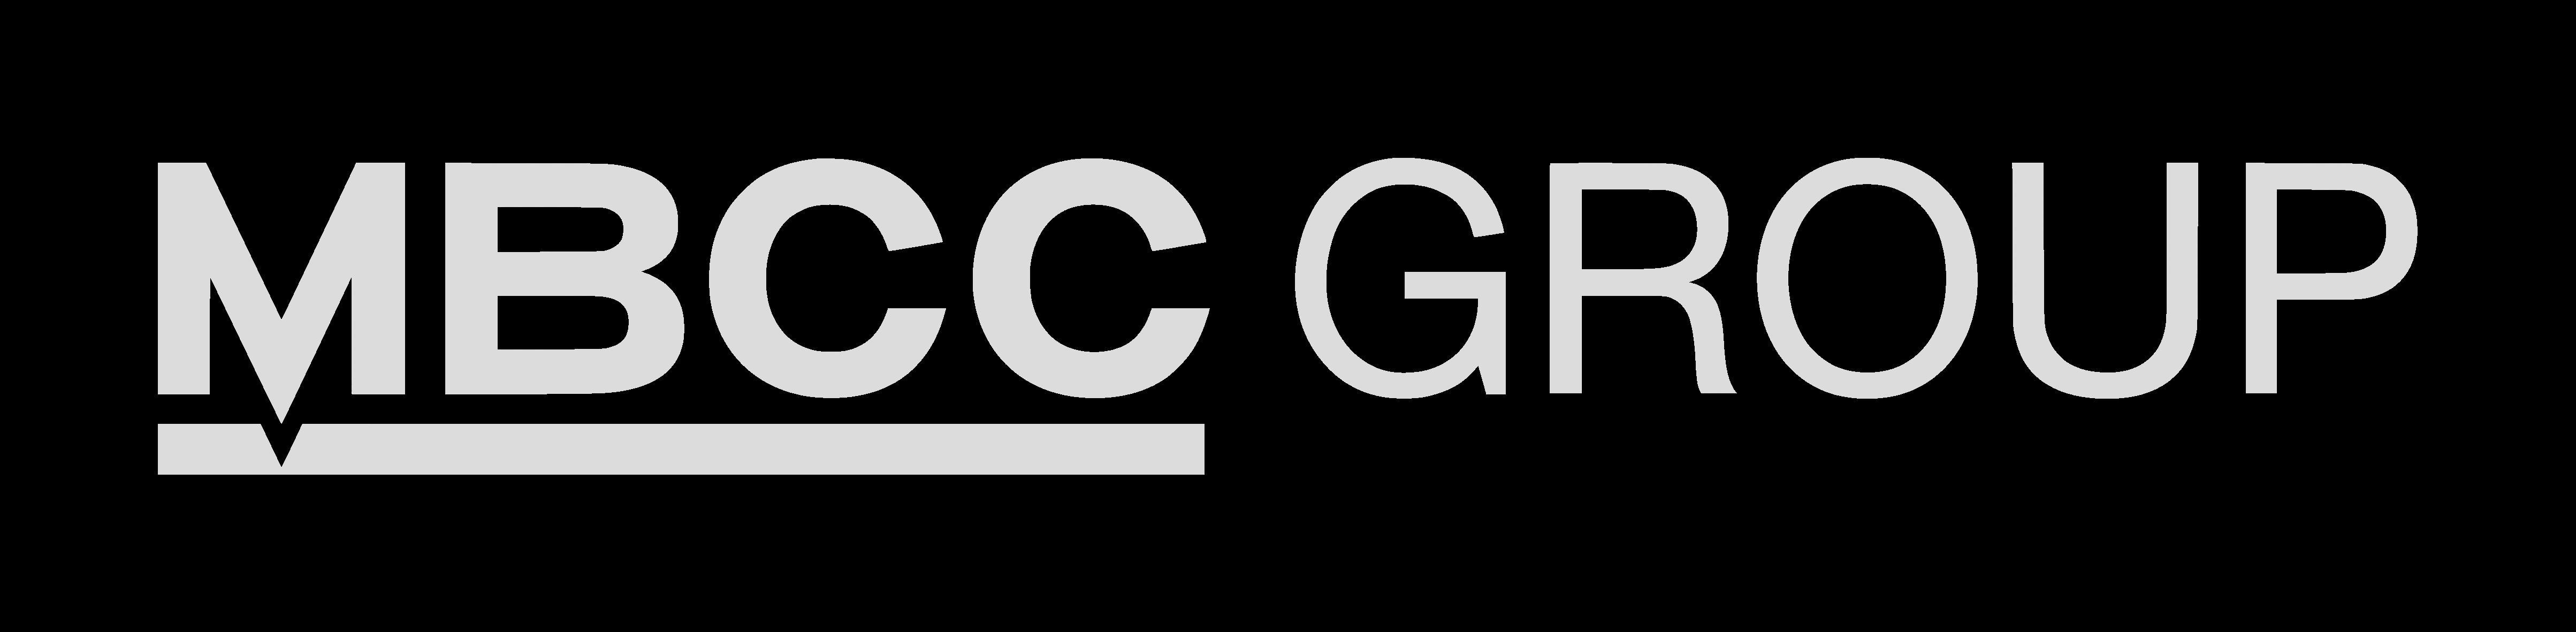 mbcc-group-logo-grey